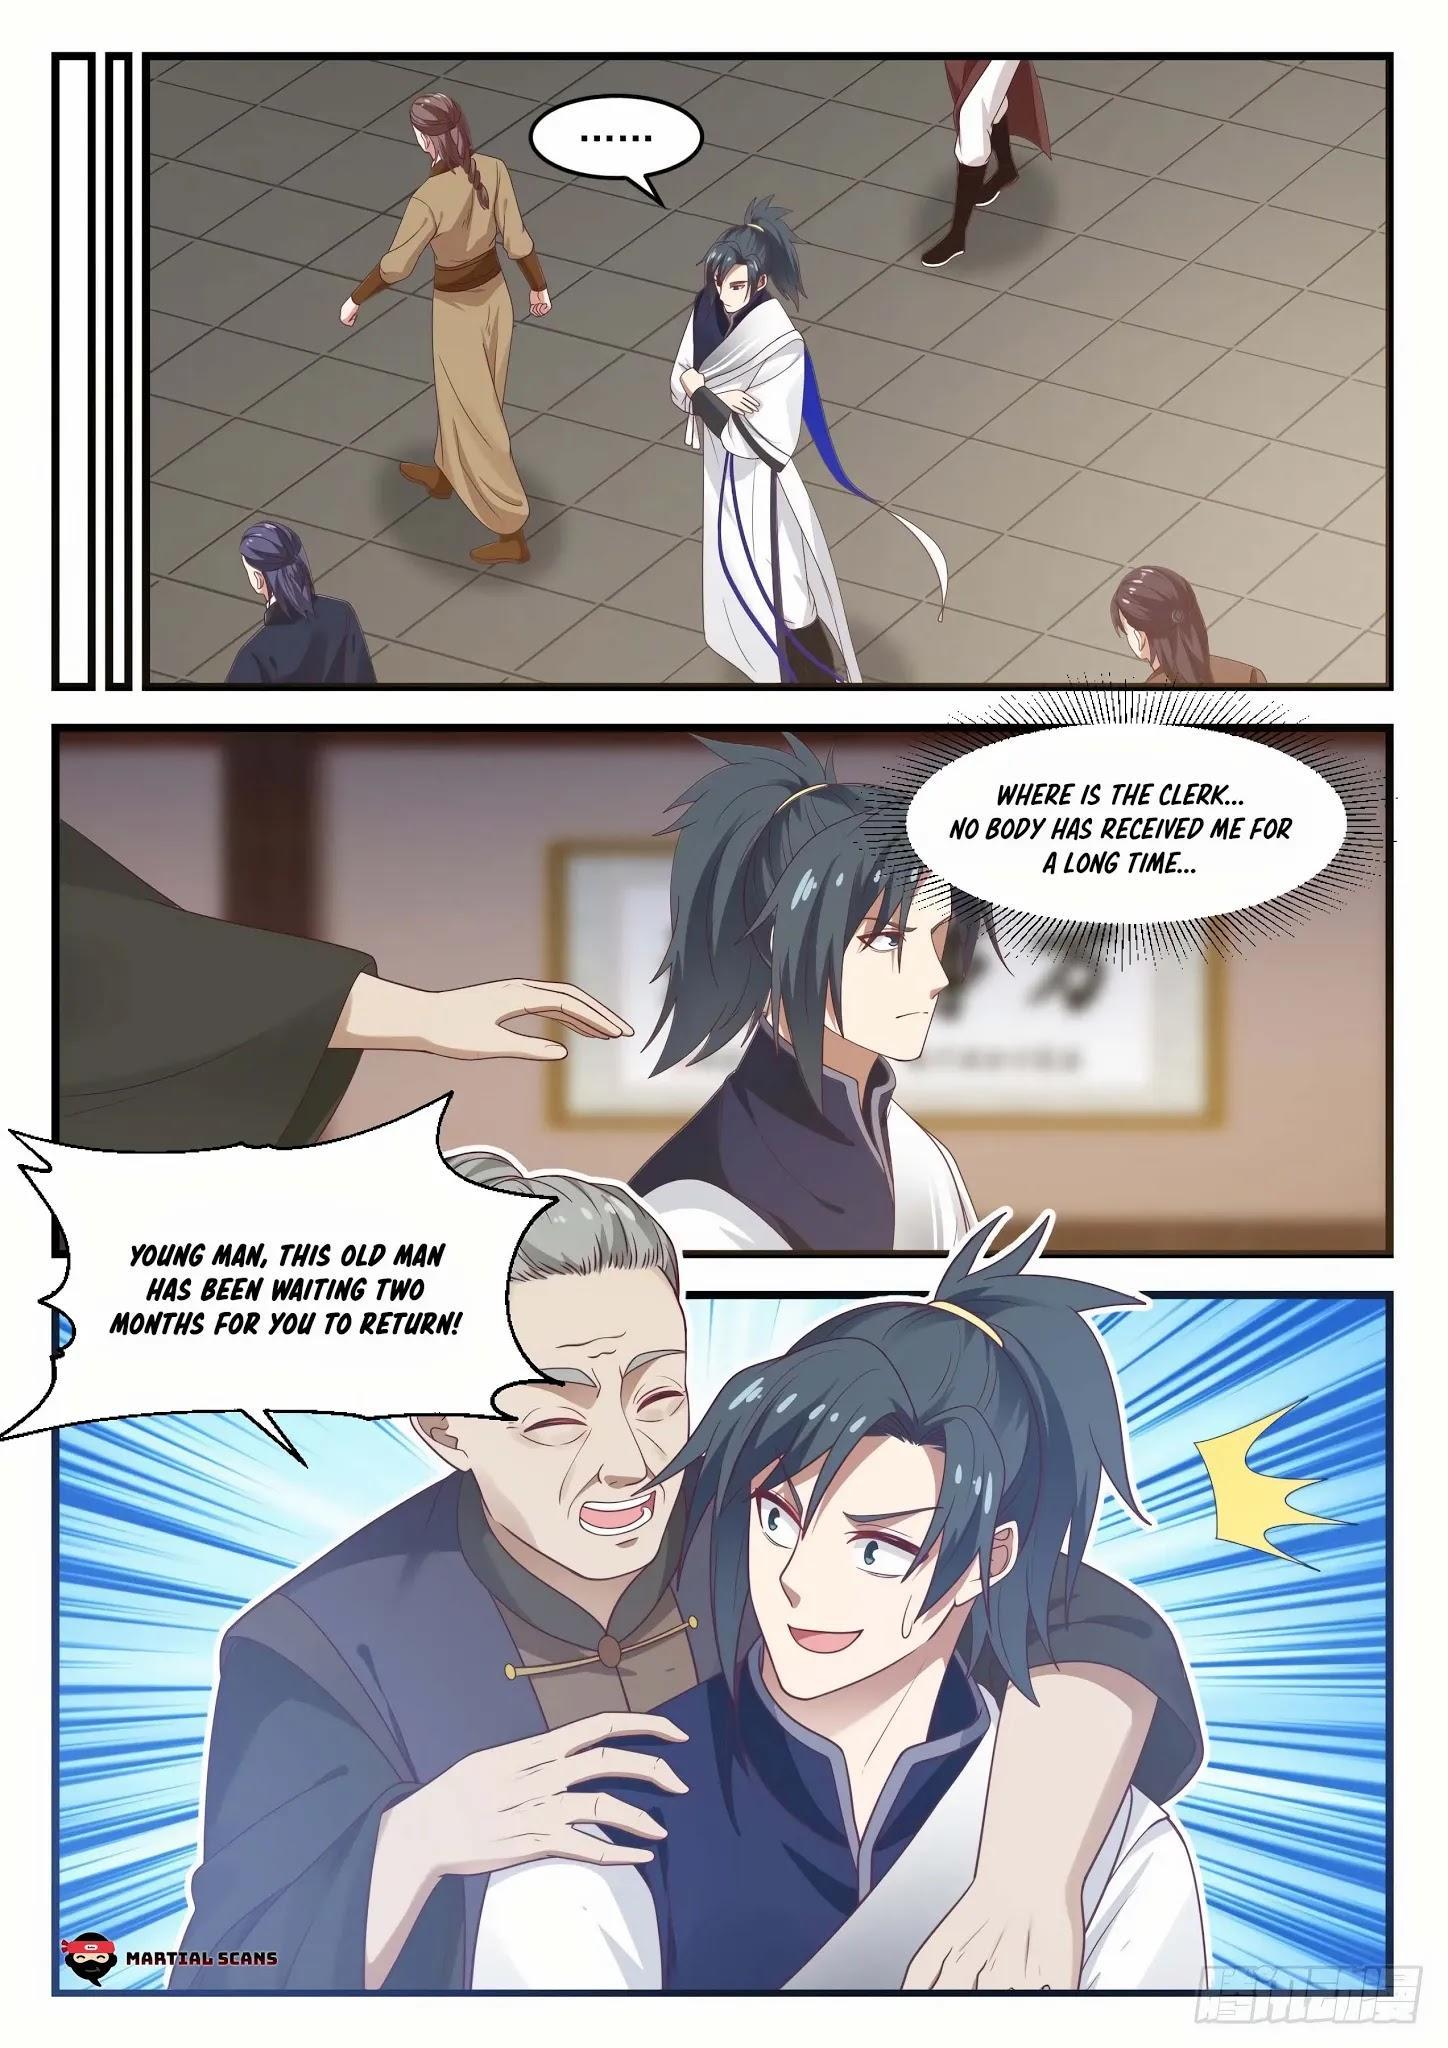 Martial Peak Chapter 999: He Came Again page 13 - Mangakakalots.com